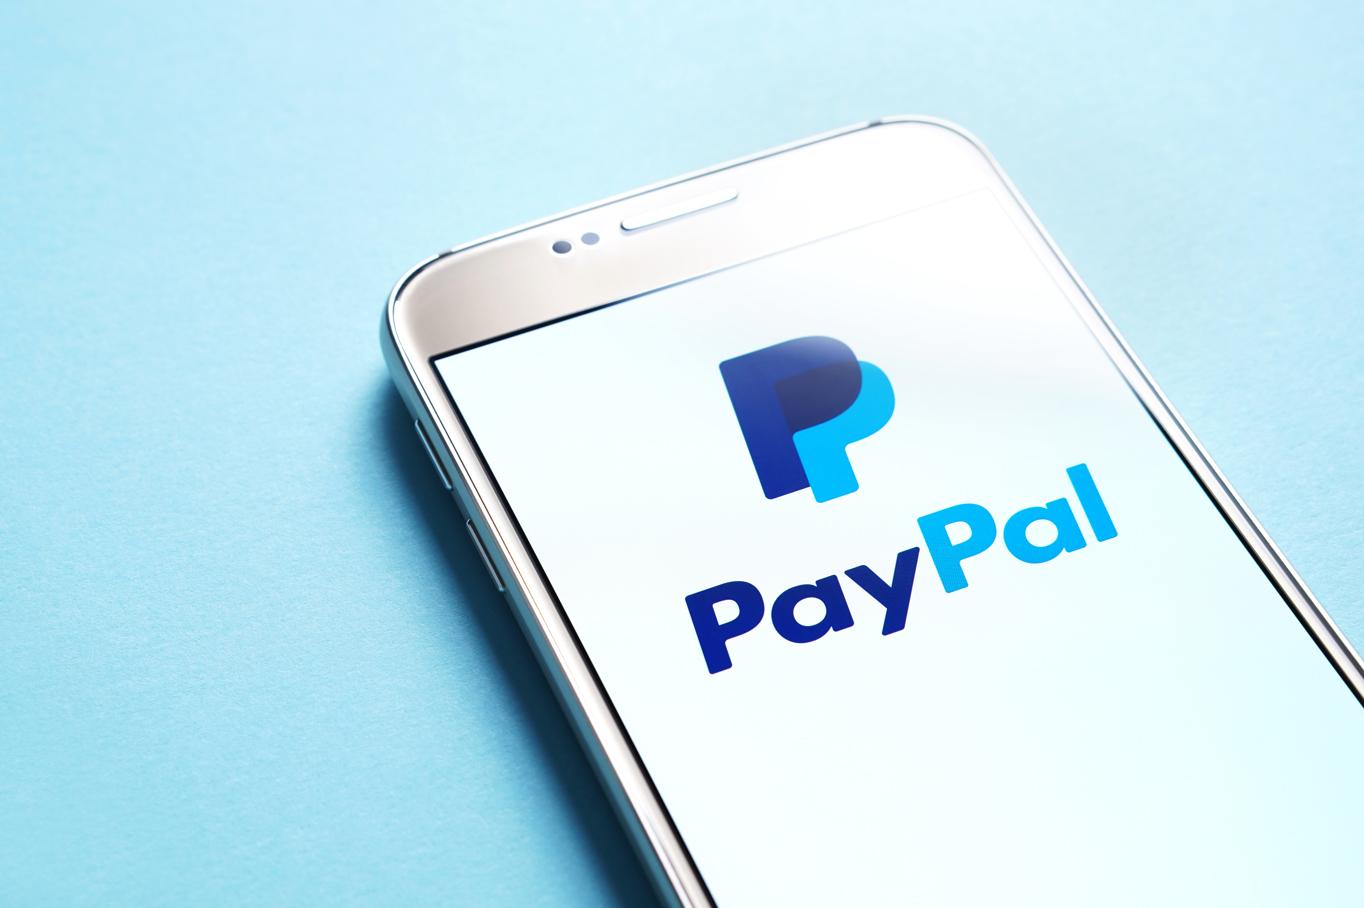 Paypal PYPL Stock news and analysis